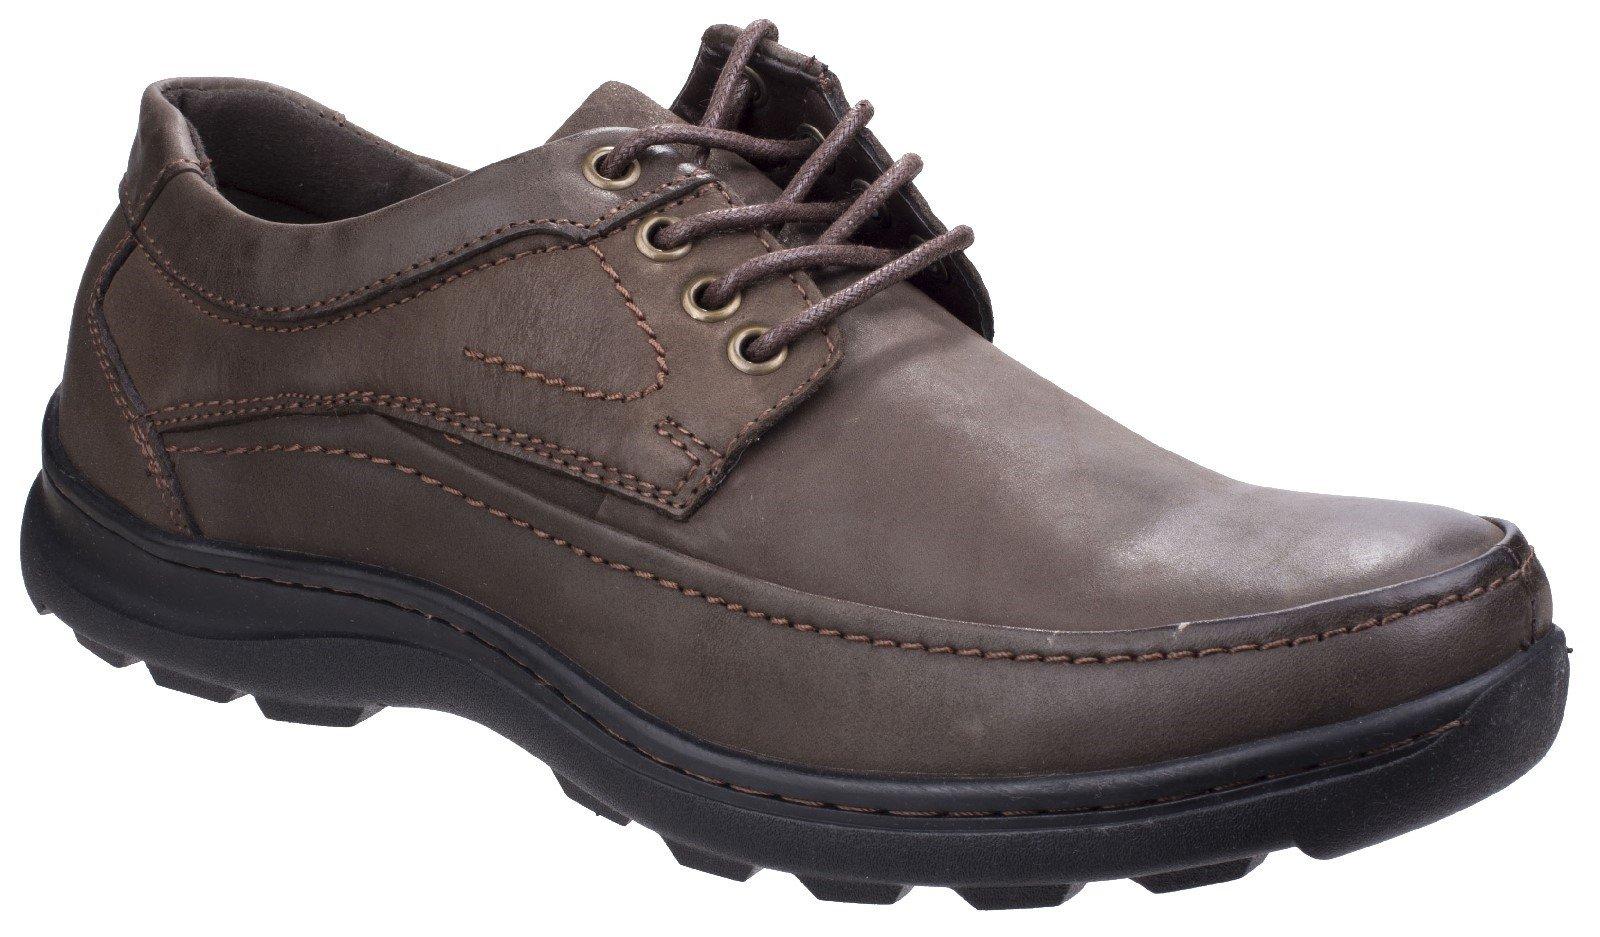 Fleet & Foster Men's Luxor Lace Up Shoe Black 26313-43921 - Brown 7